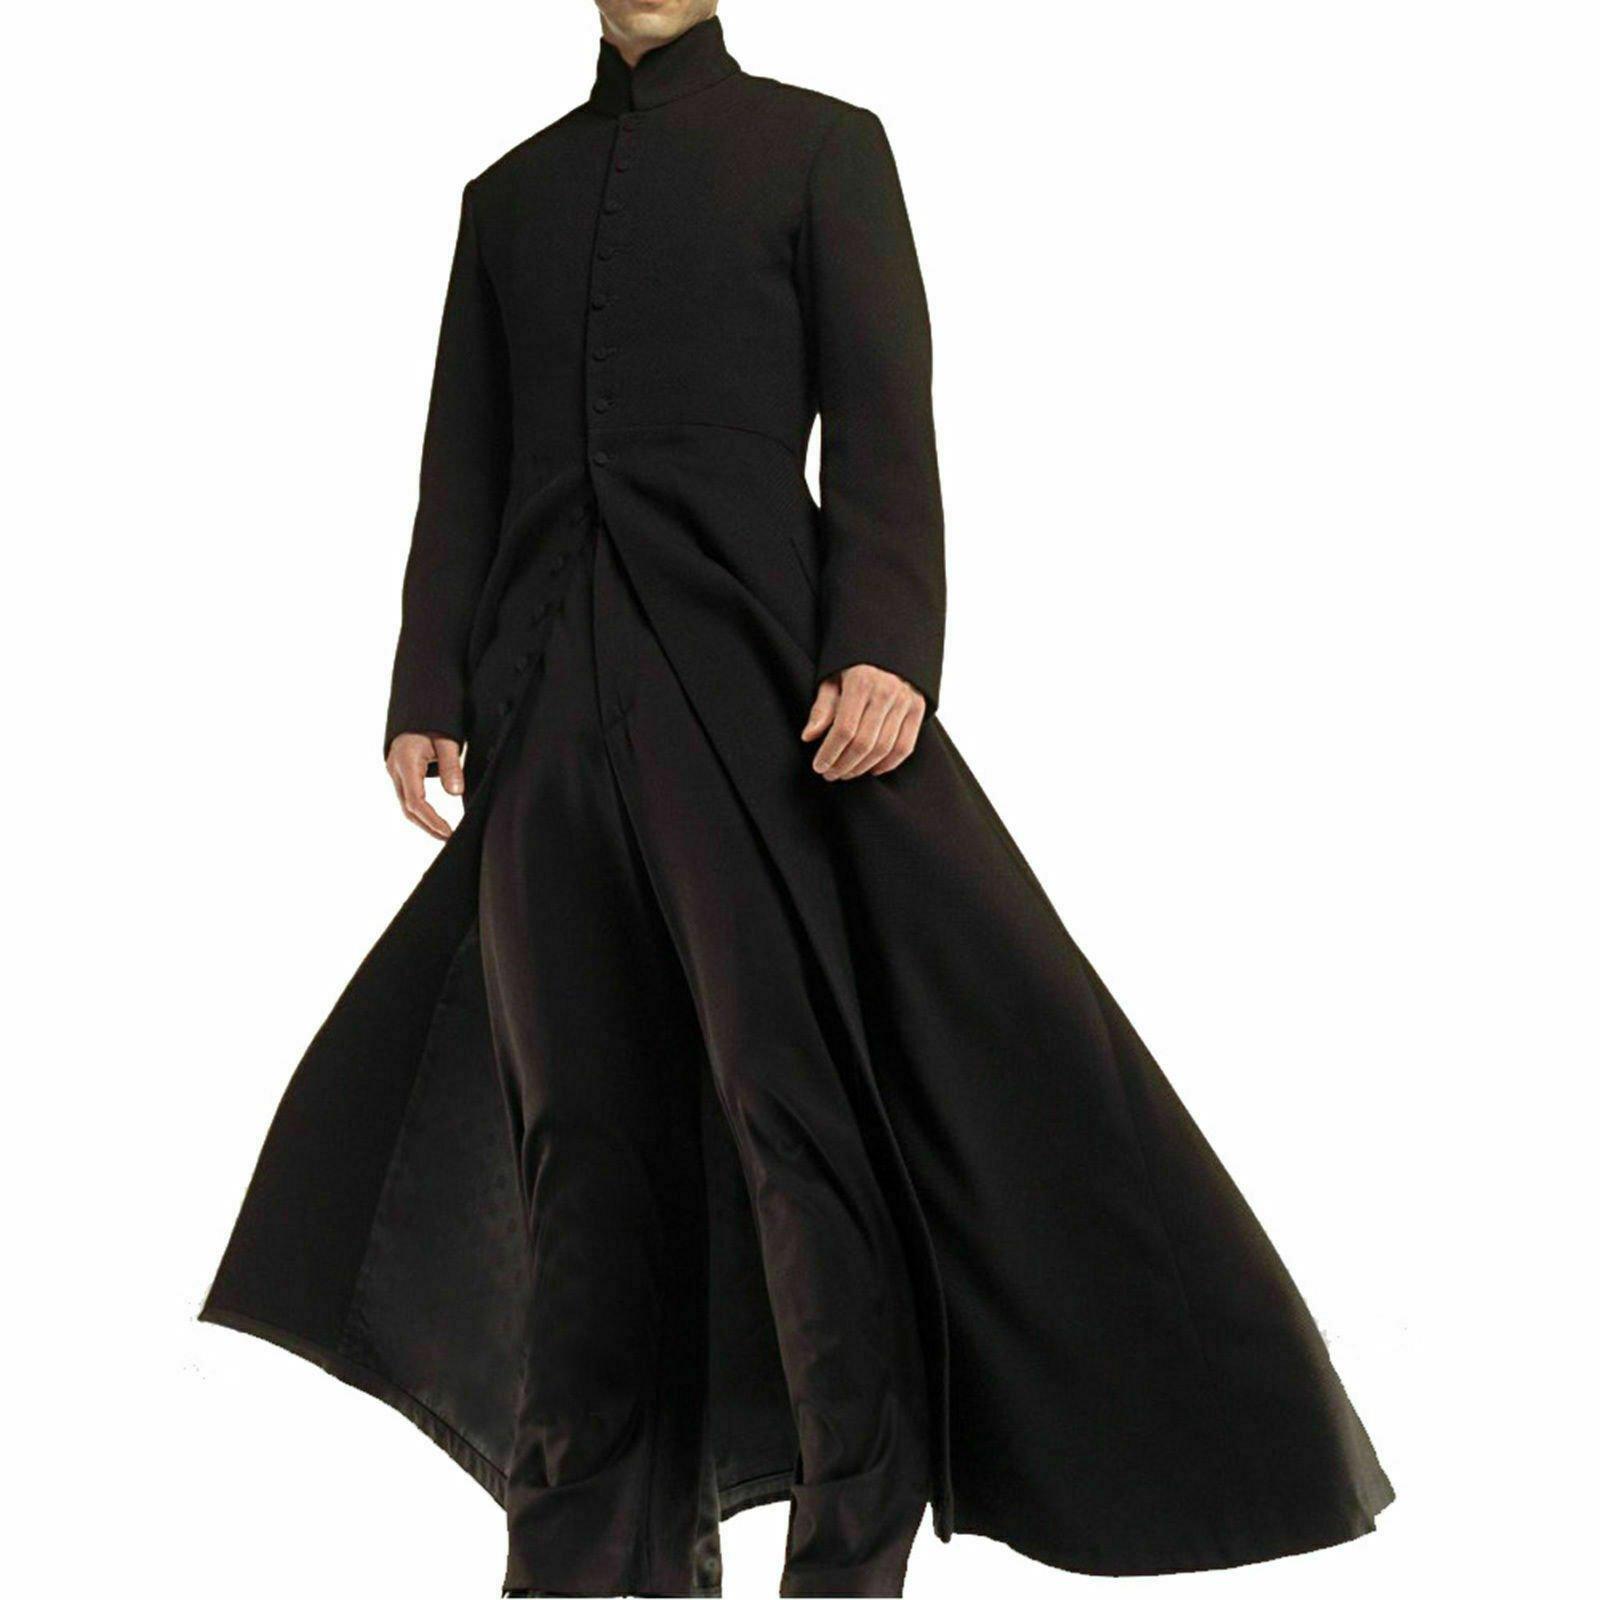 Darkrock Neo Matrix Heavy Duty Cotton Keanu Reeves Black Gothic Cosplay Trench Coat (2)